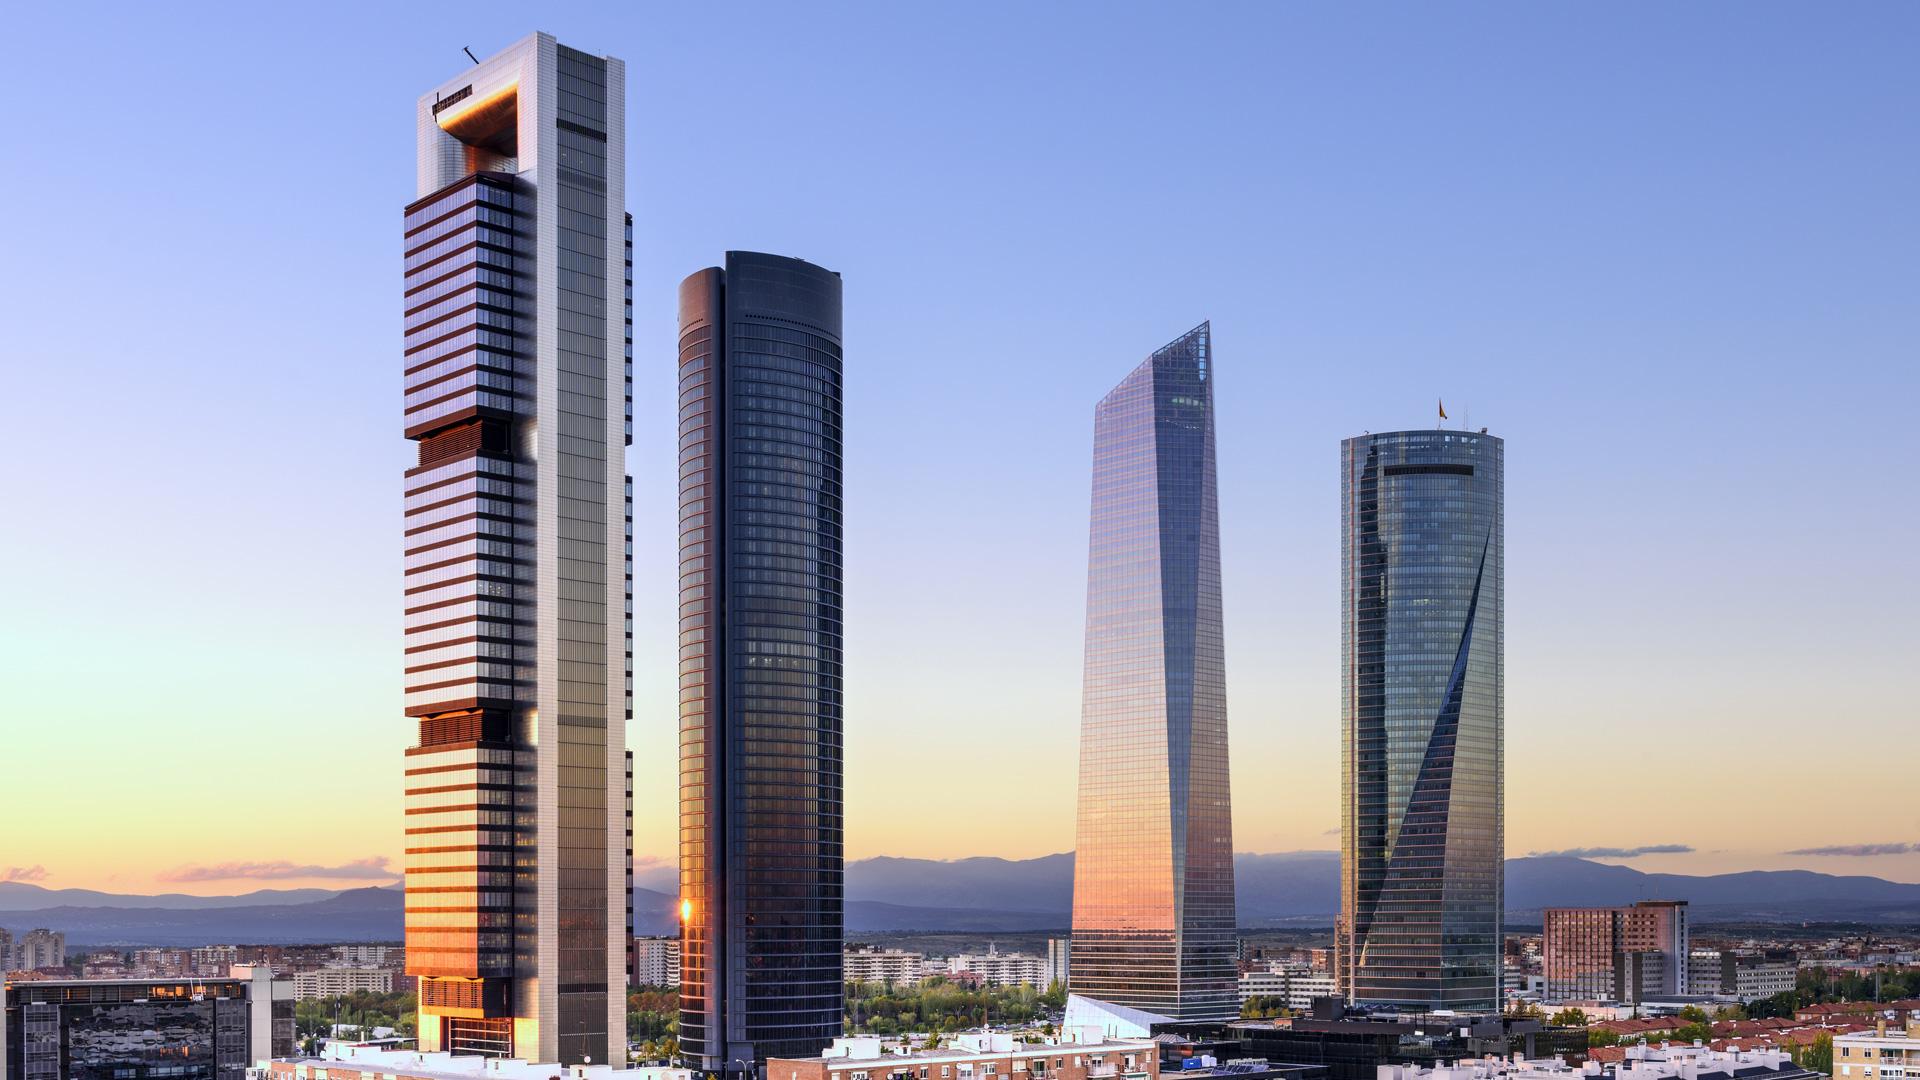 Hospital De Dia Madrid Of Insp Rame Madrid By Gonzalo Cebri N